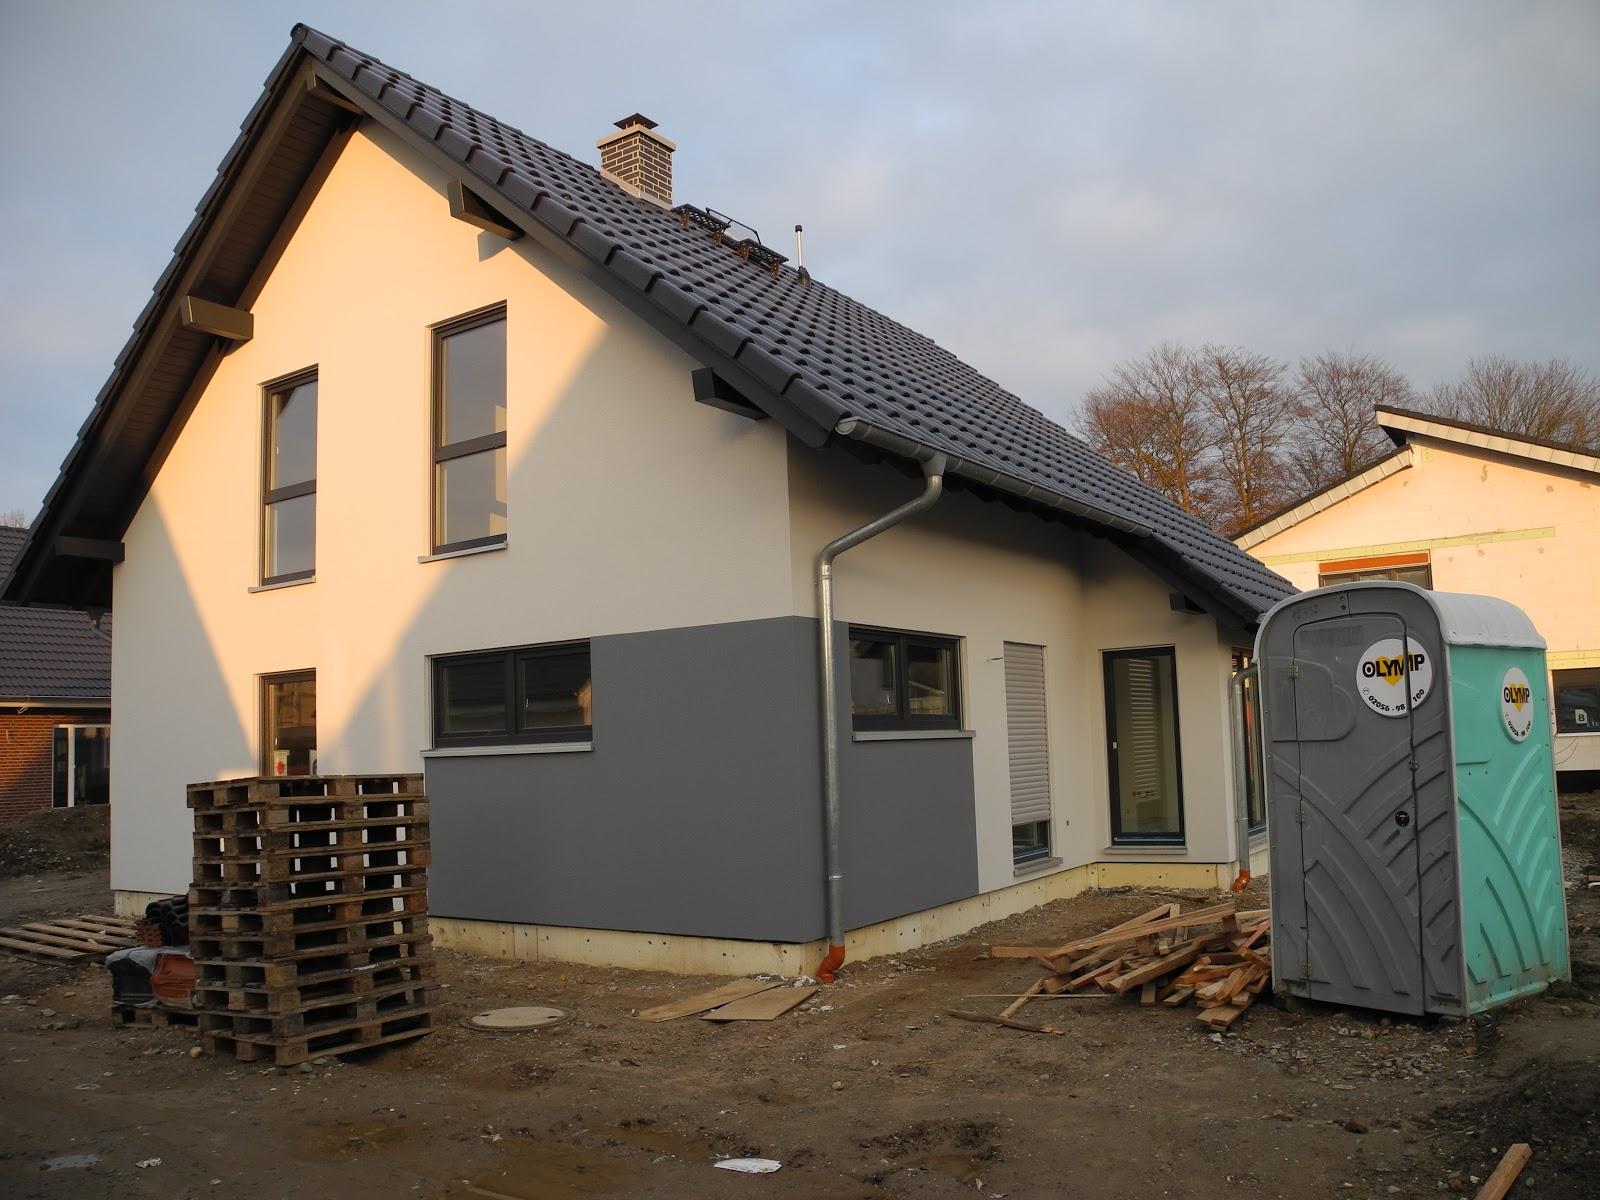 fingerhaus vio 302 in nrw. Black Bedroom Furniture Sets. Home Design Ideas